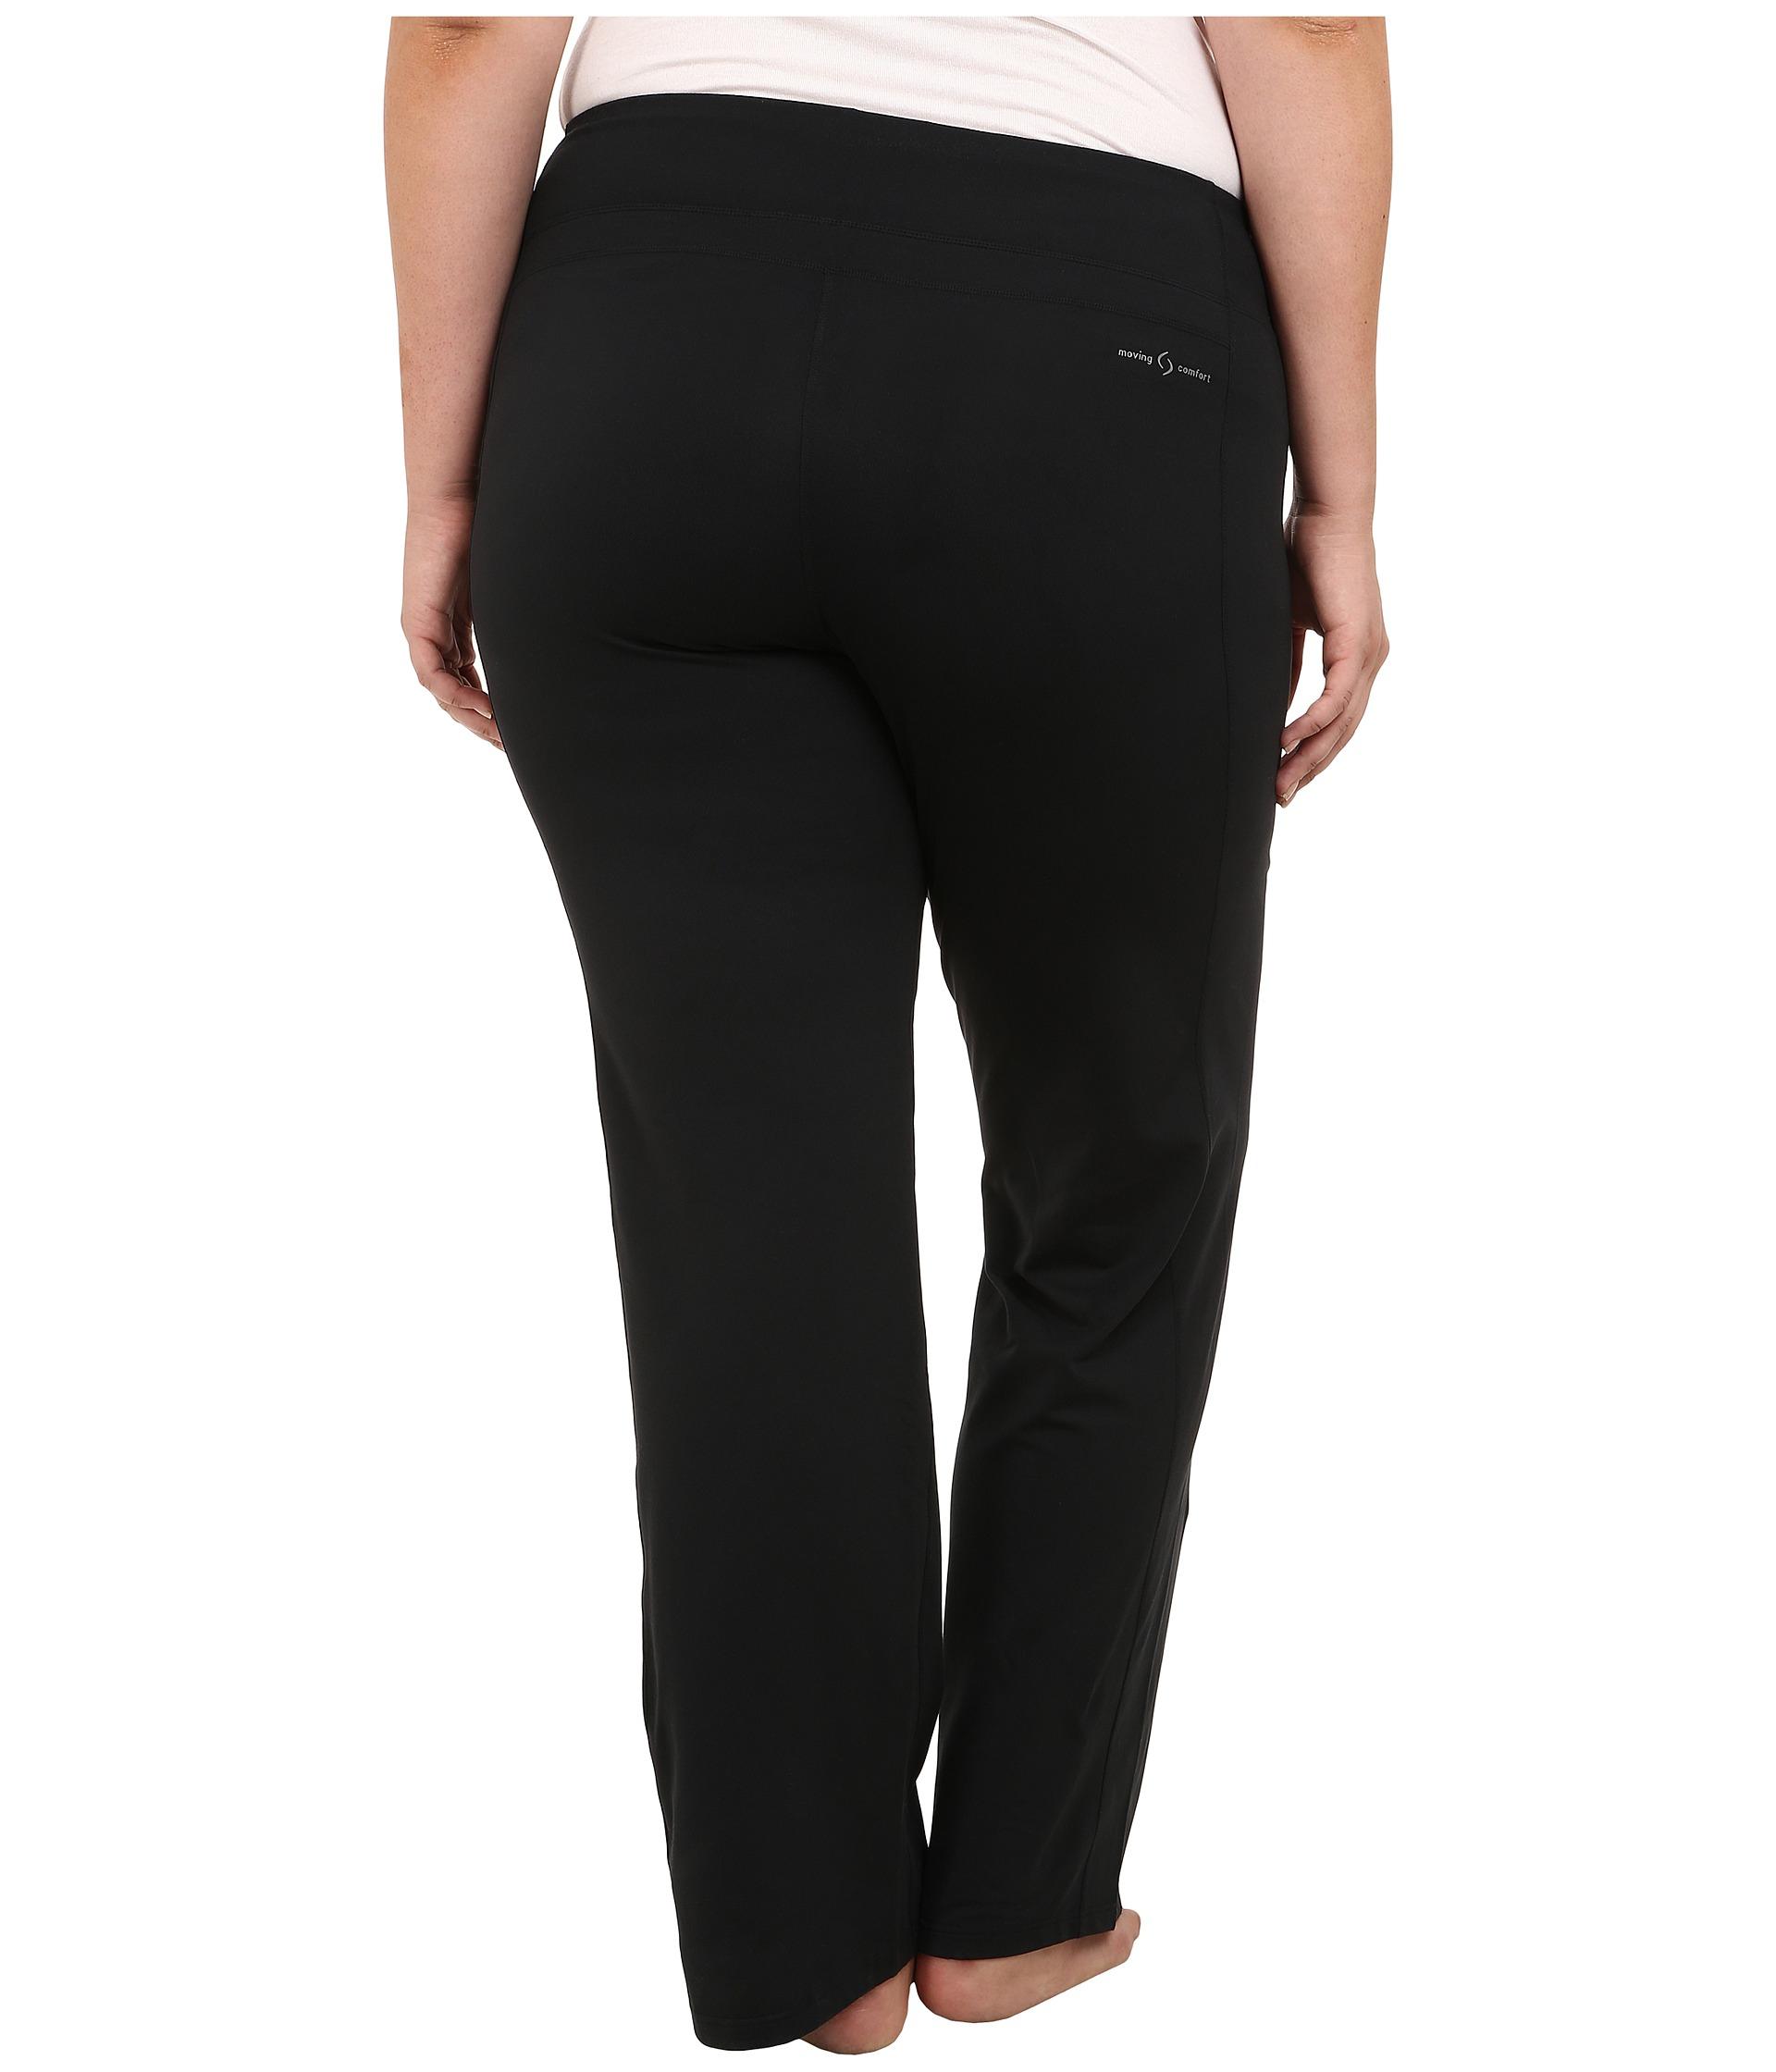 pants shot save p navy medium comfort bloom sports bra in women comforter hot for moving impact